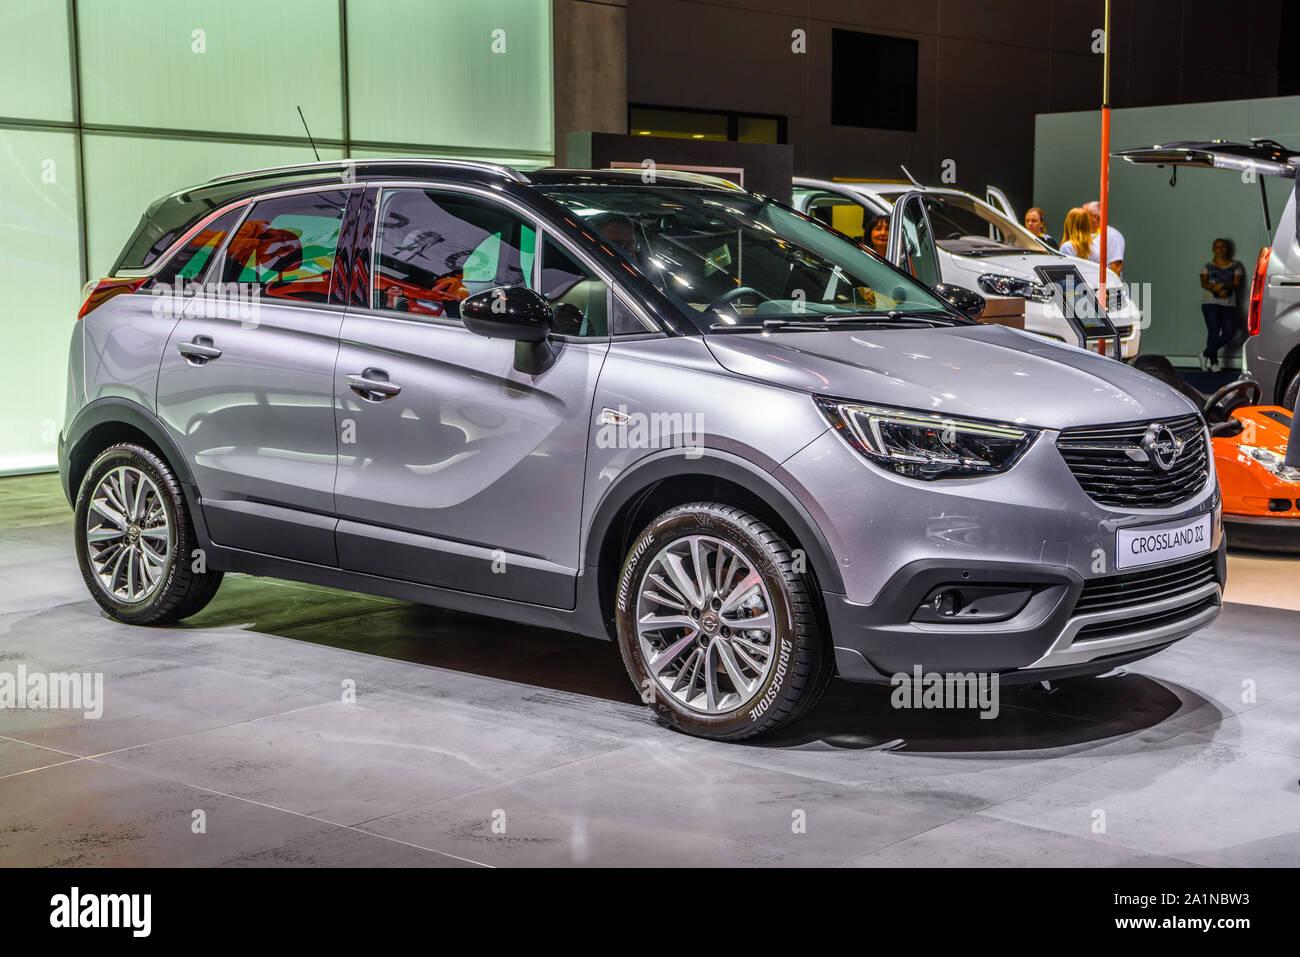 Frankfurt Germany Sept 2019 Silver Gray Opel Crossland X Small Suv Iaa International Motor Show Auto Exhibtion Stock Photo Alamy